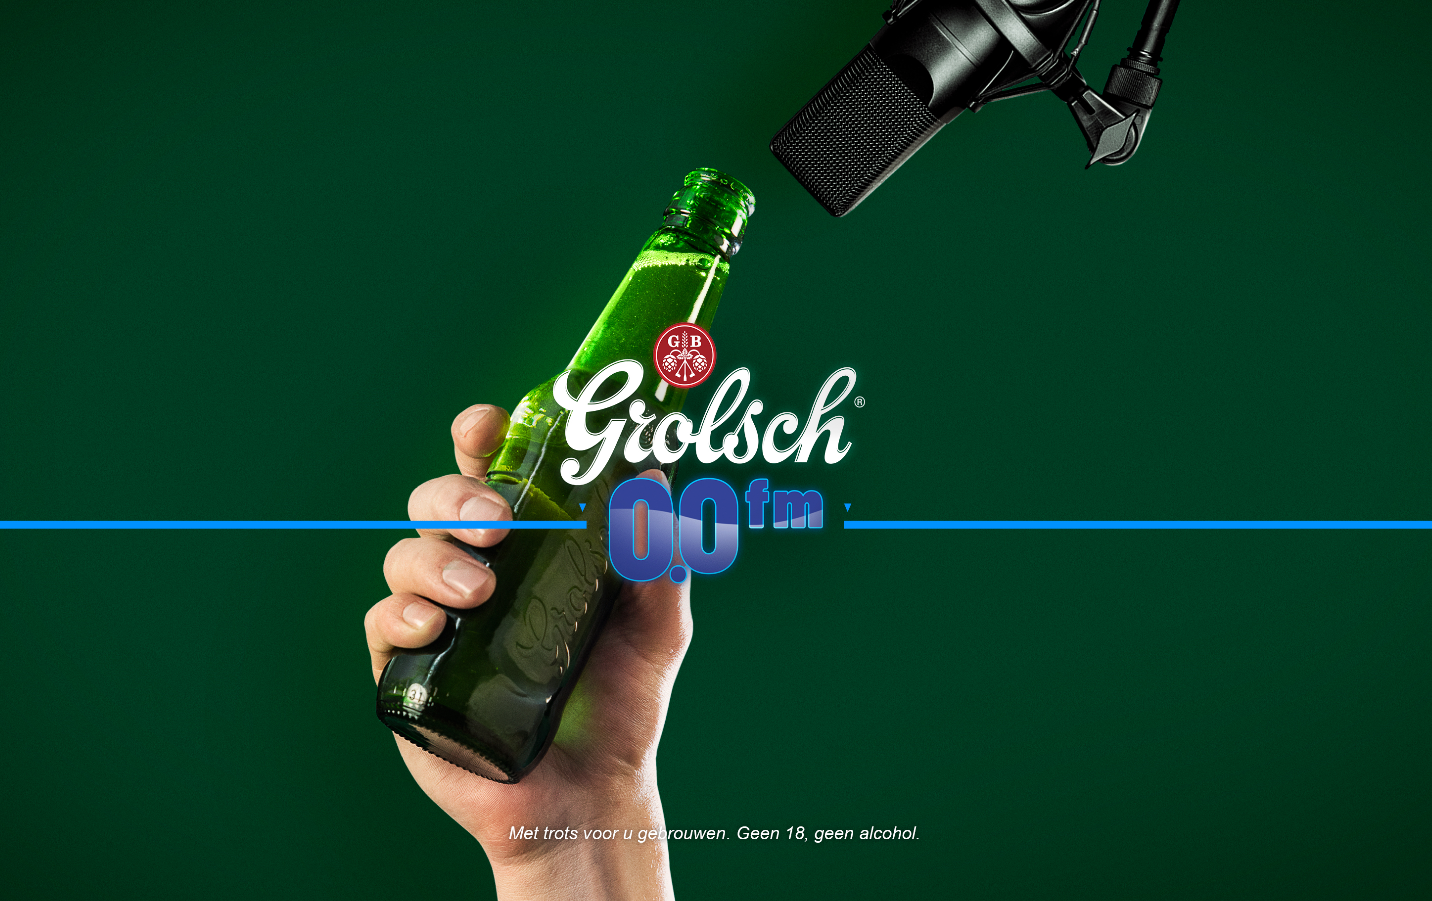 Grolsch and Talpa Network launch Grolsch 0.0 FM